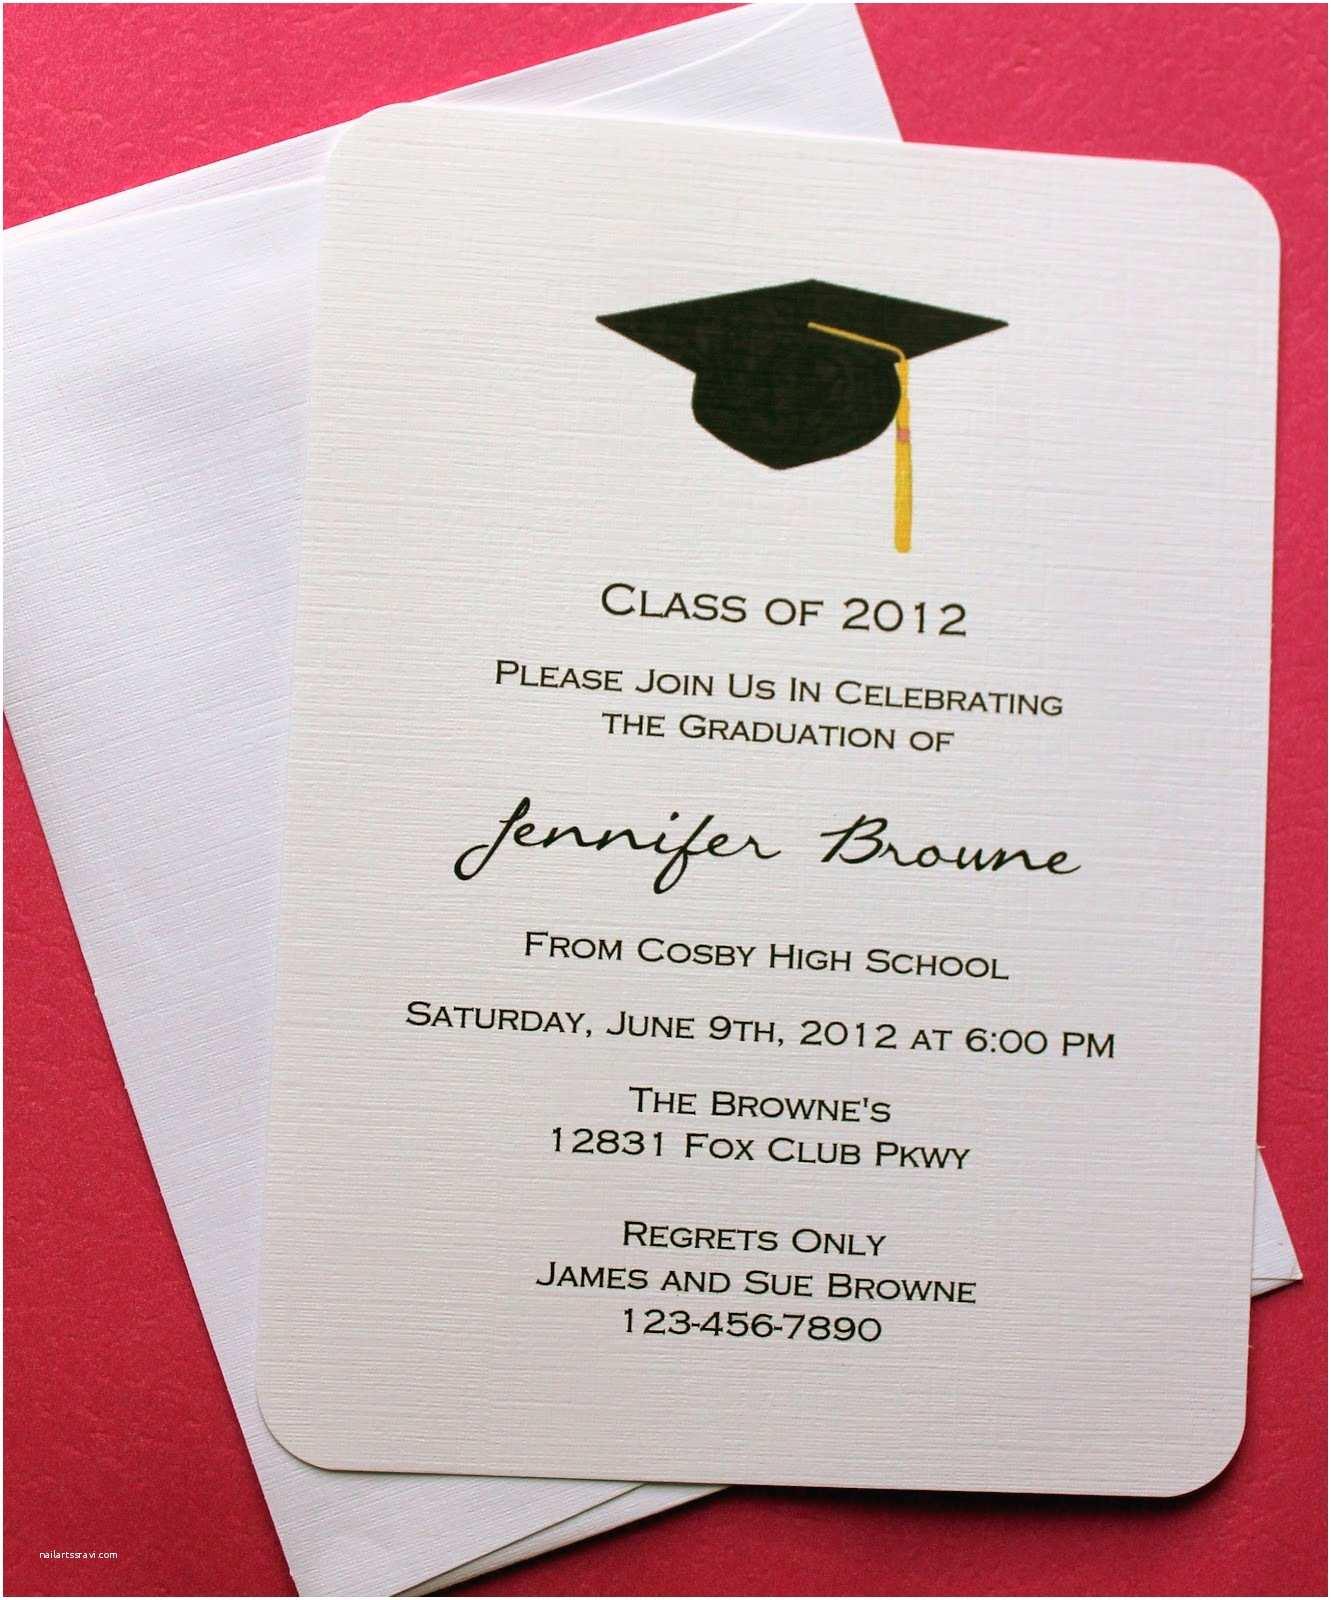 Graduation Invitations Templates Free Graduation Invitations Templates